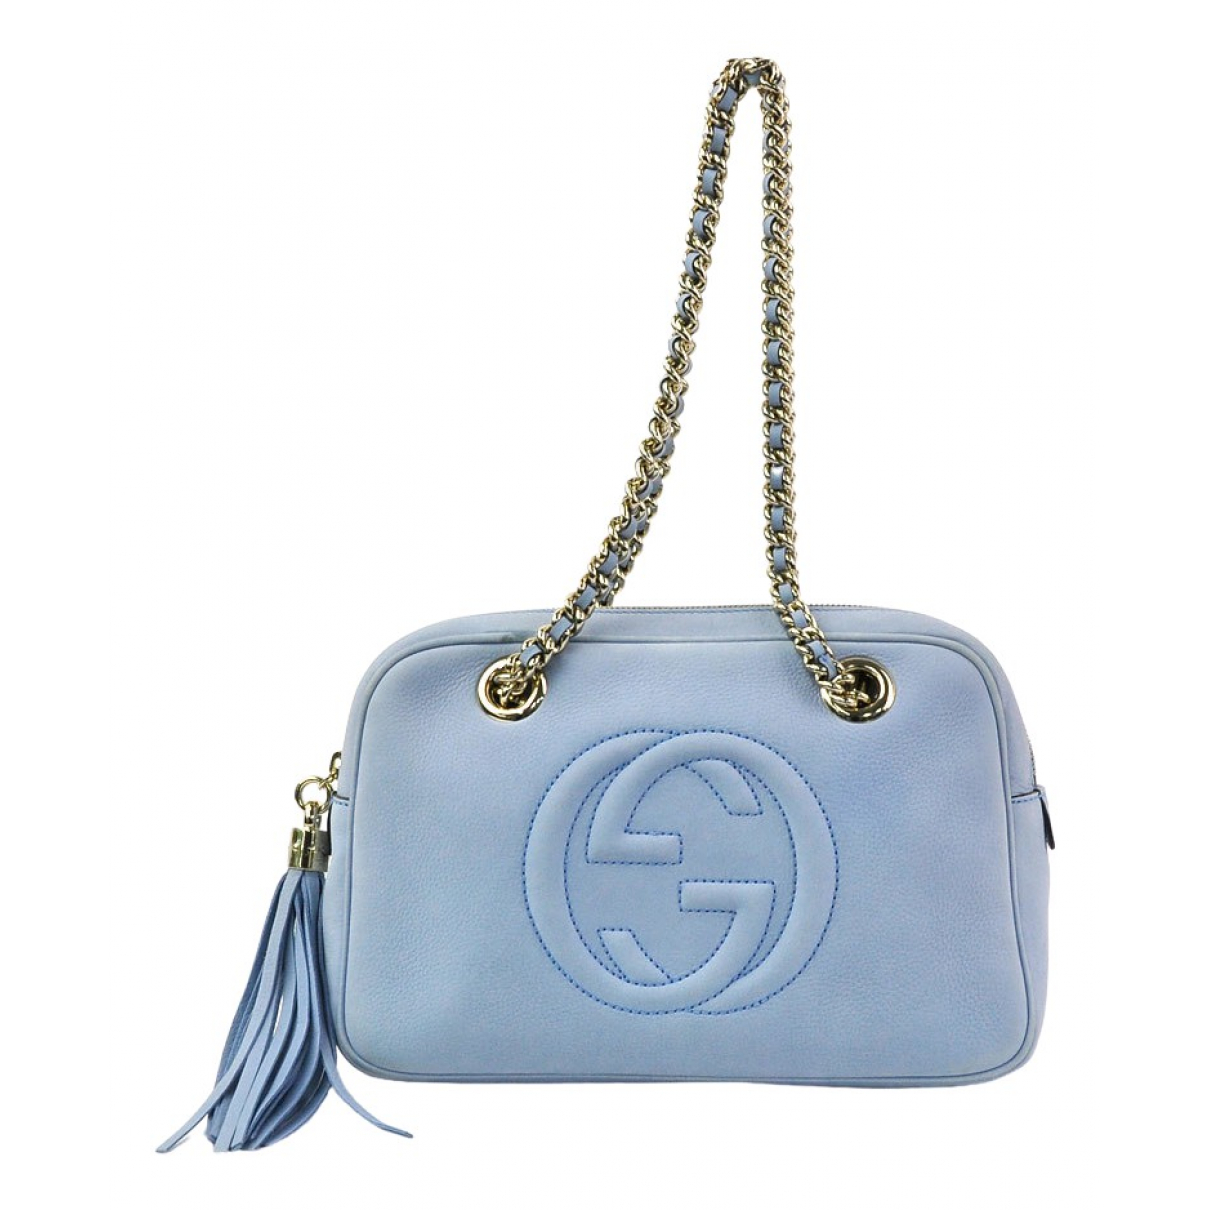 Gucci Soho Handtasche in  Blau Leder